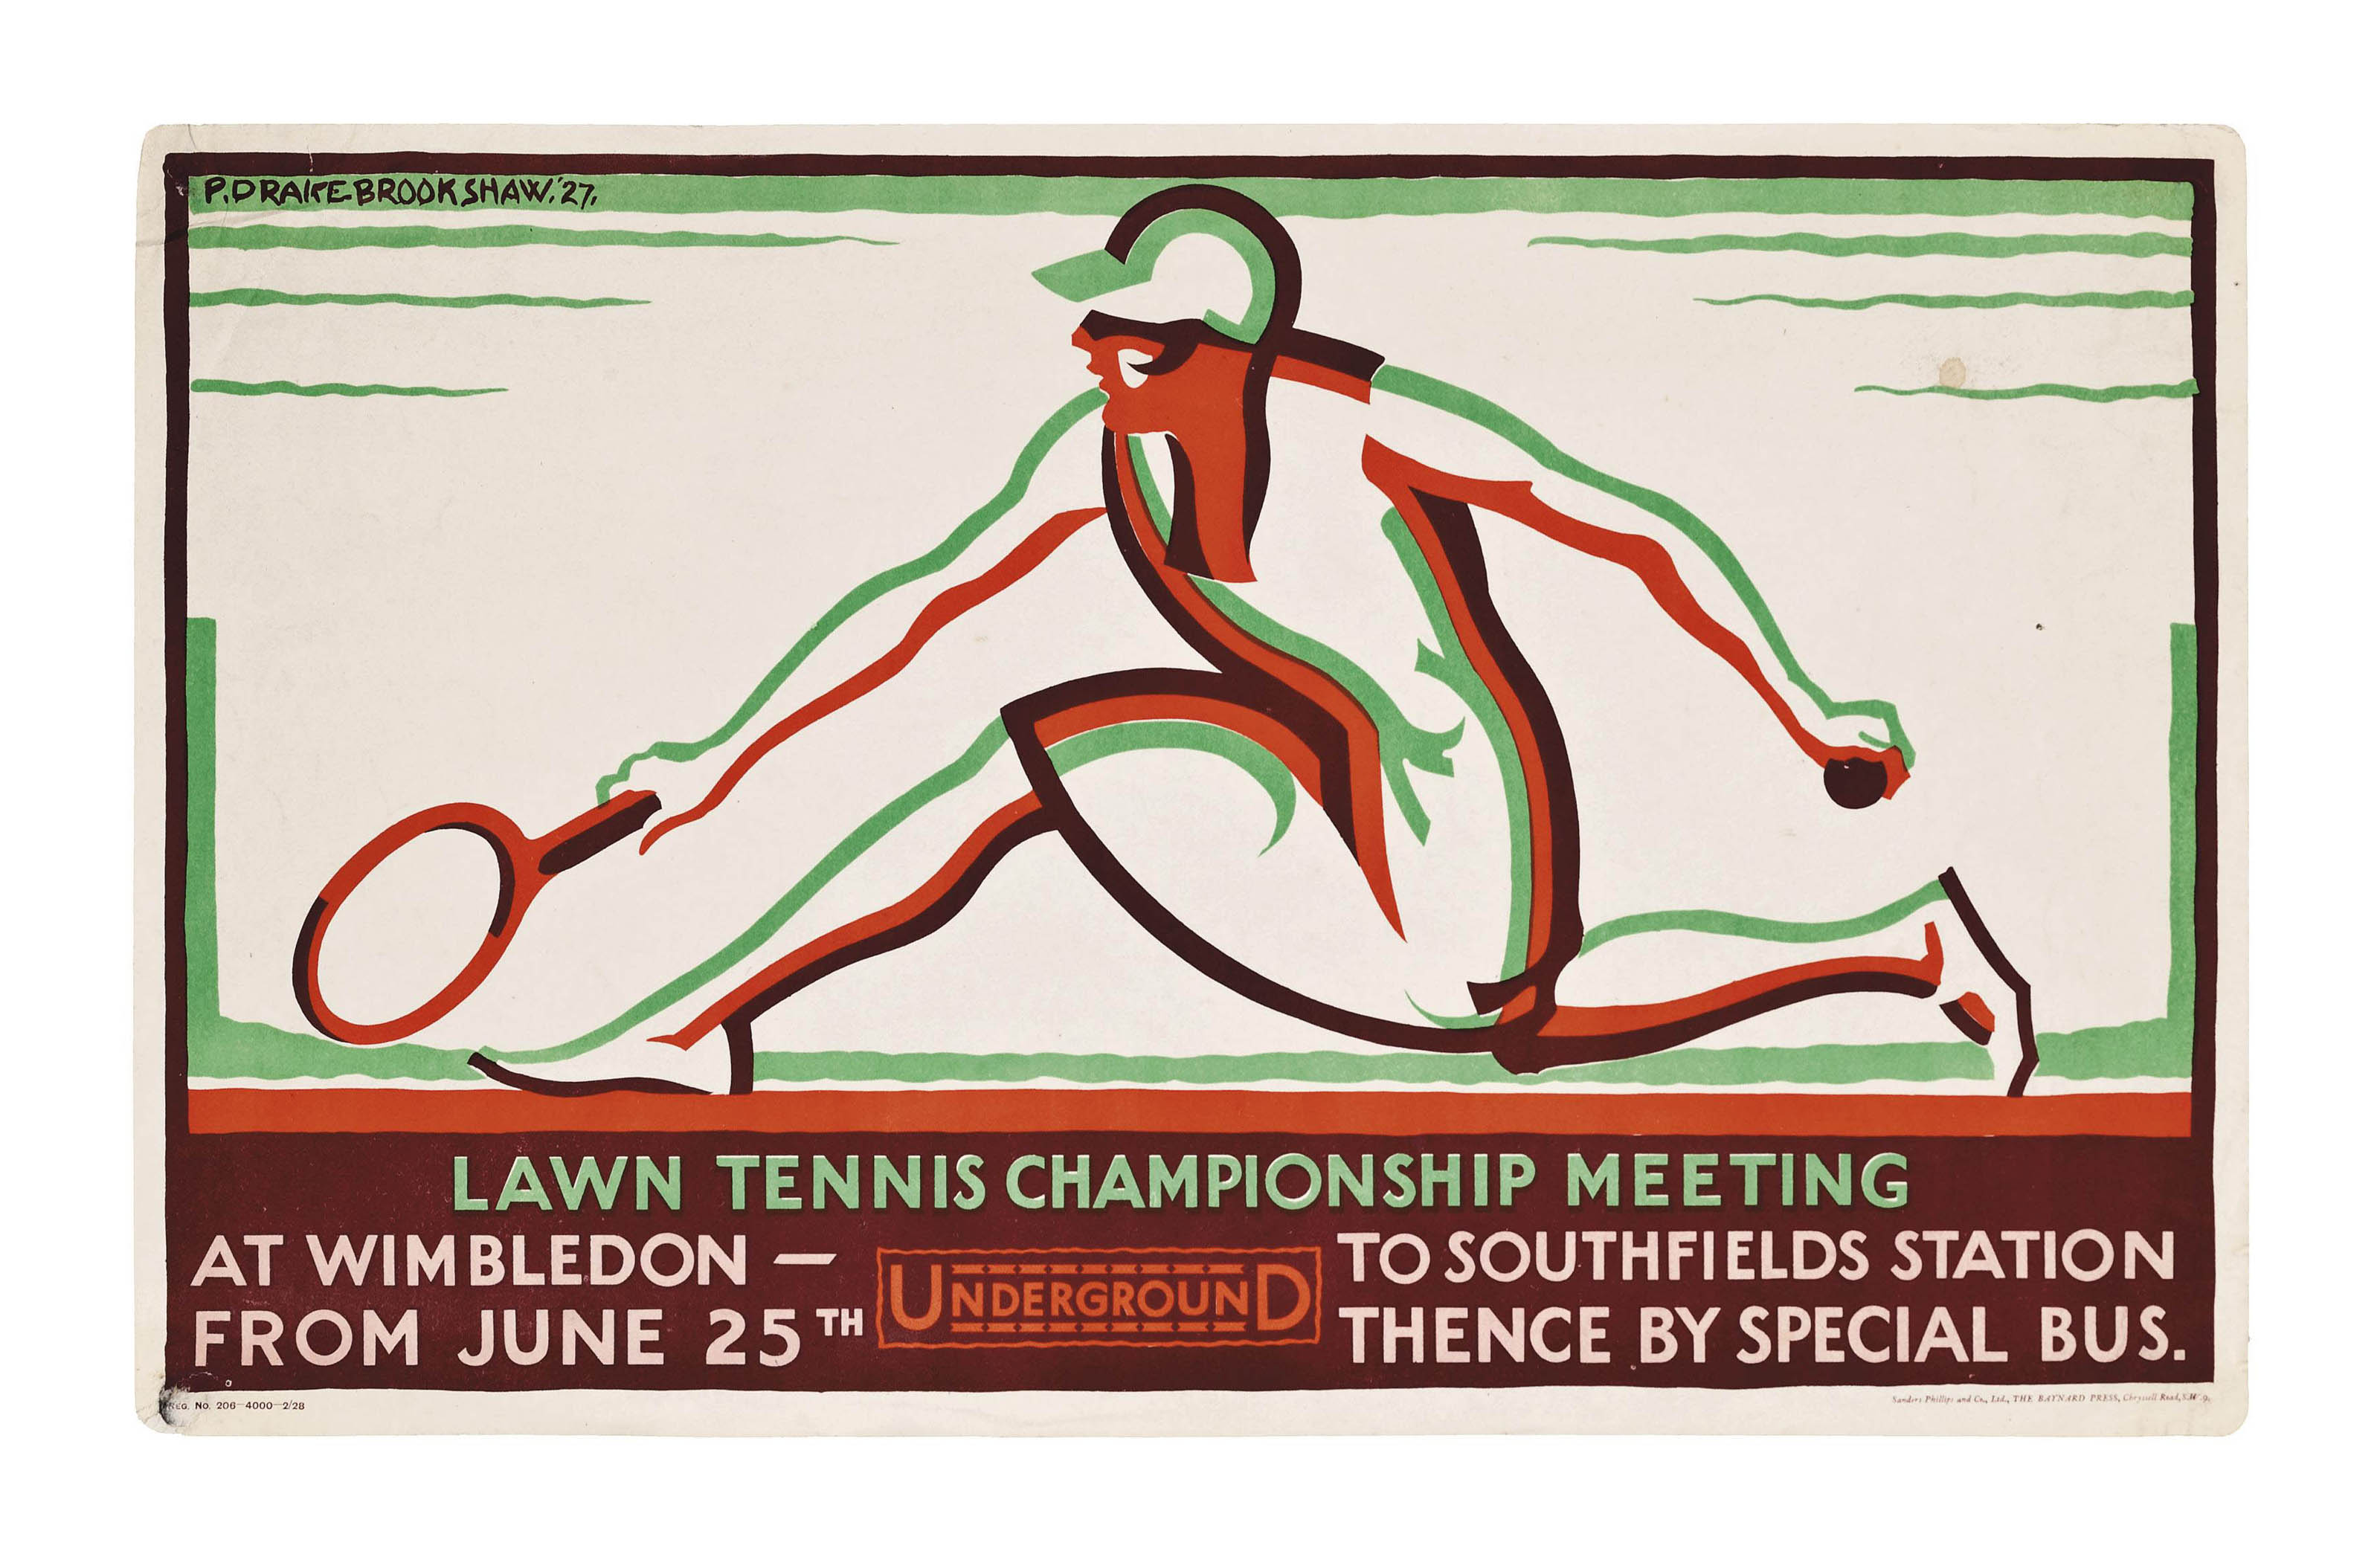 LAWN TENNIS CHAMPIONSHIP MEETING